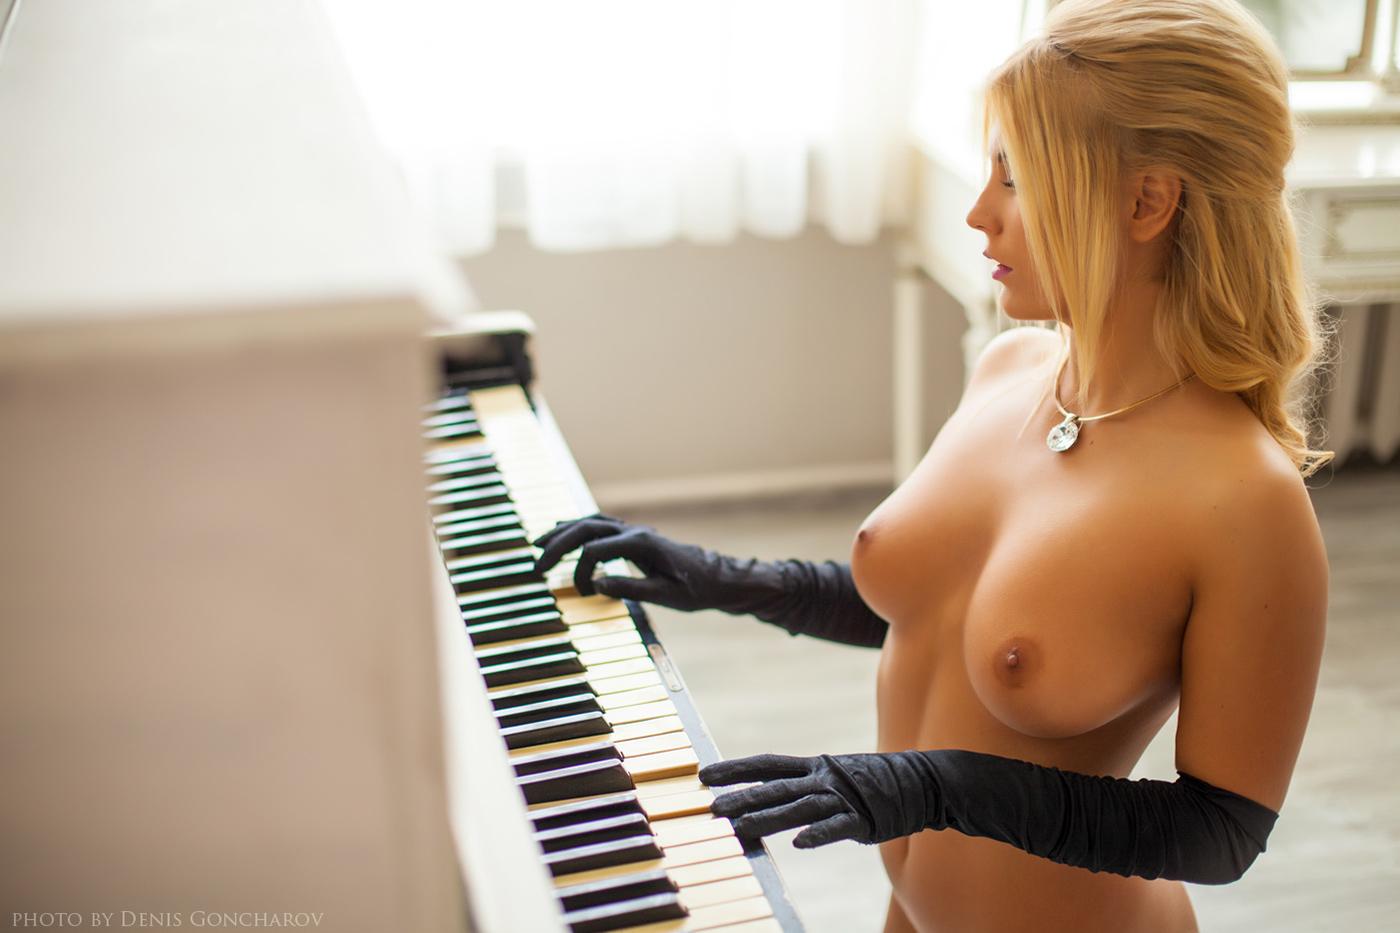 Порно видео лесбиянки на рояле